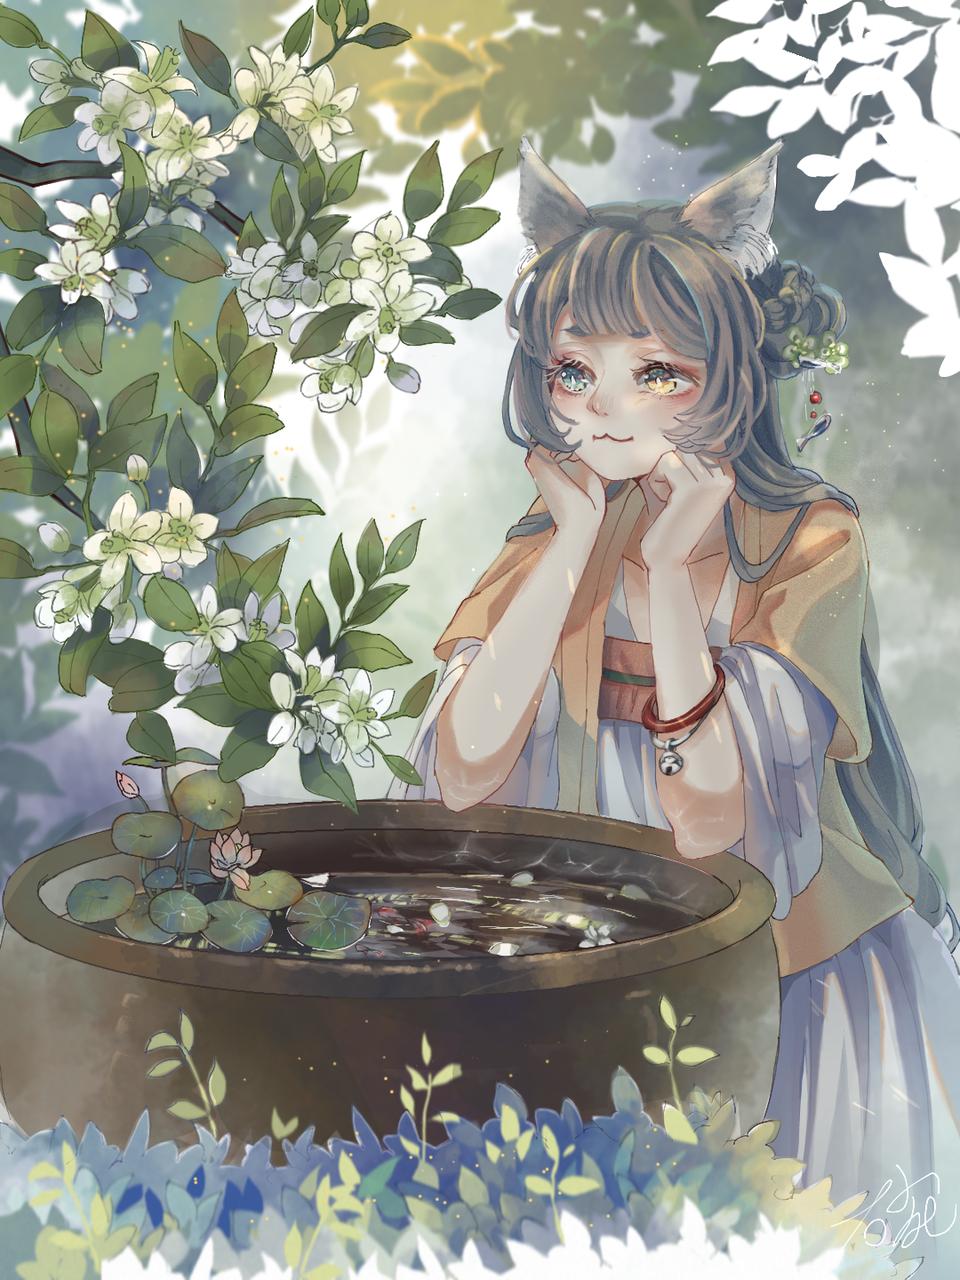 观锯树有感 Illust of 那我男神就张培基吧 medibangpaint original girl 柚子花 cat_ears 中国风